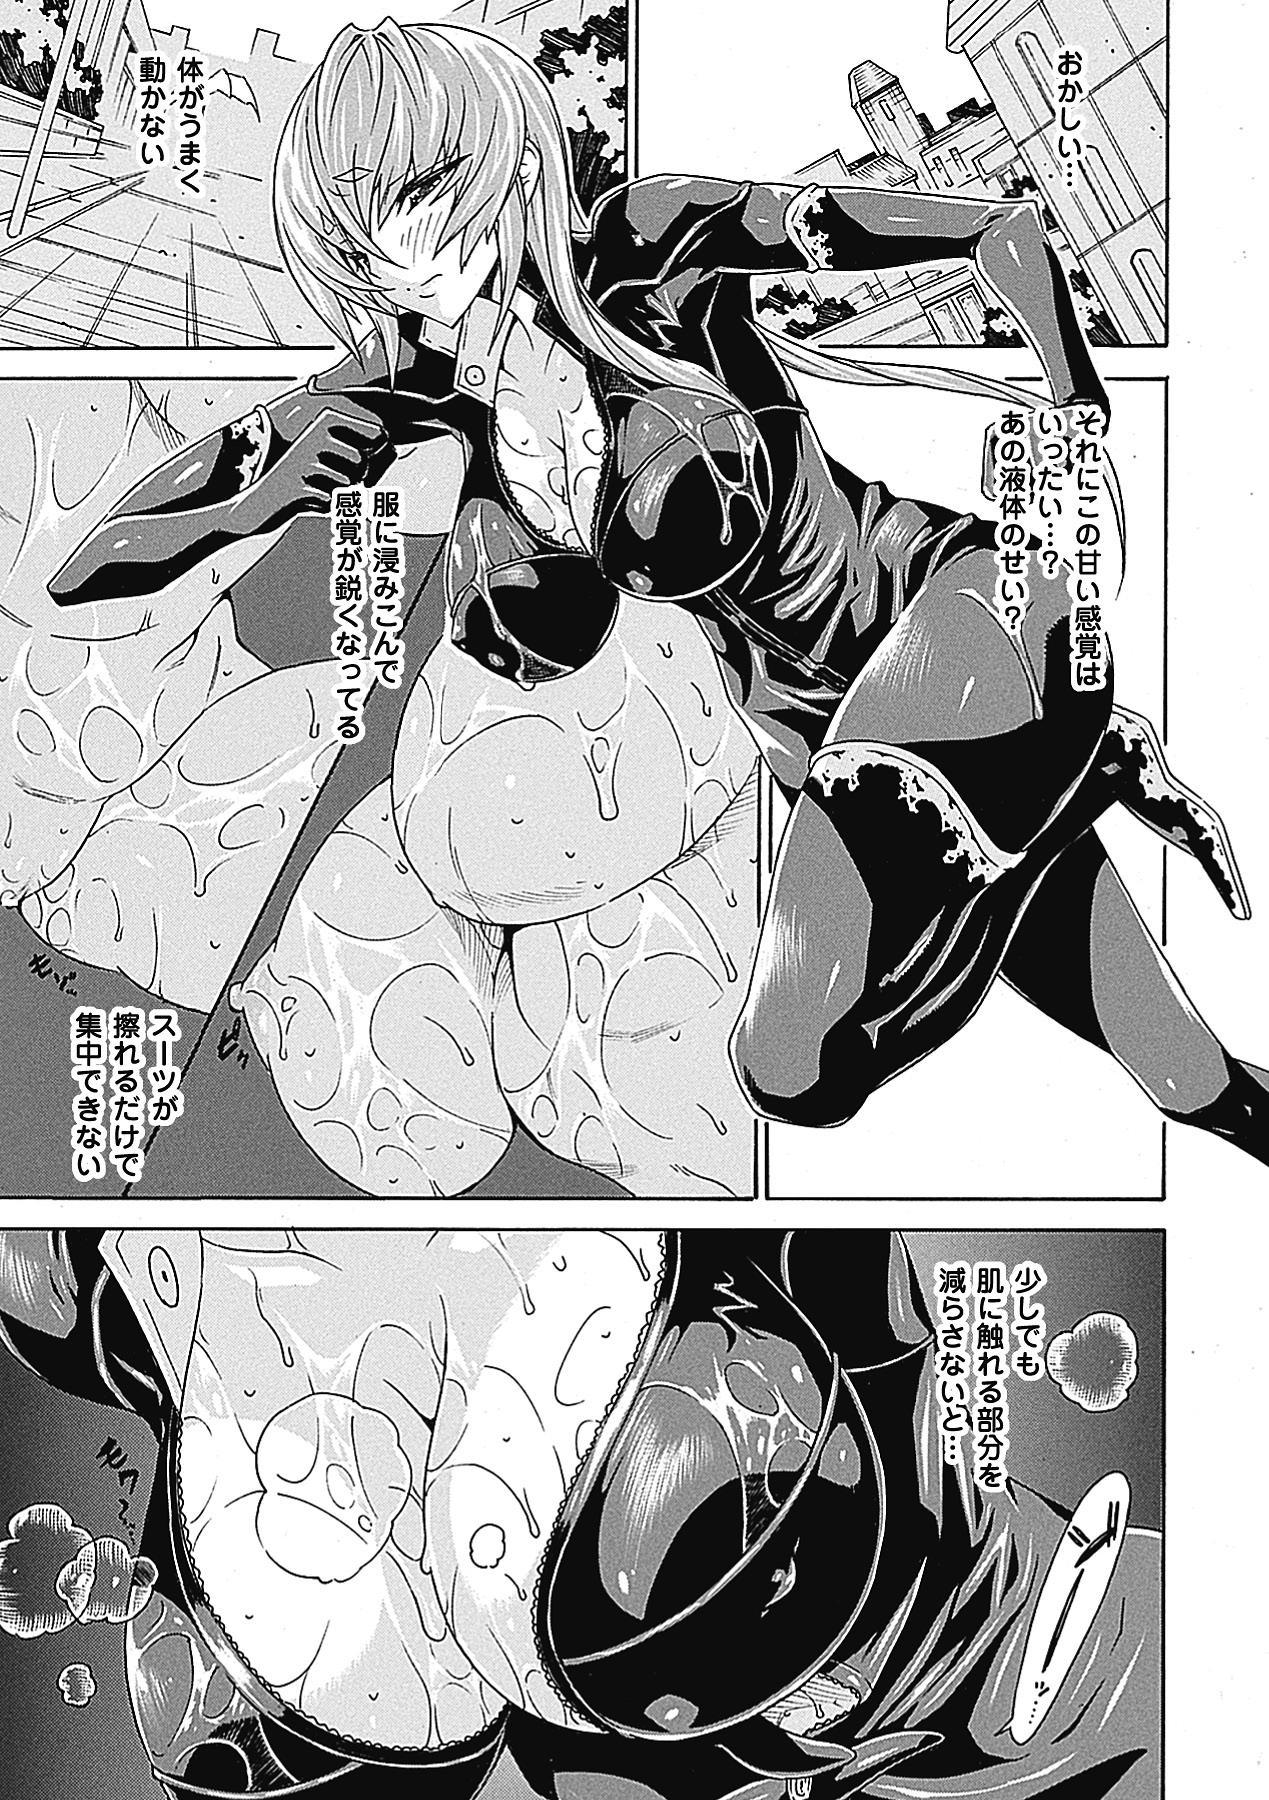 Megami Crisis 1 75